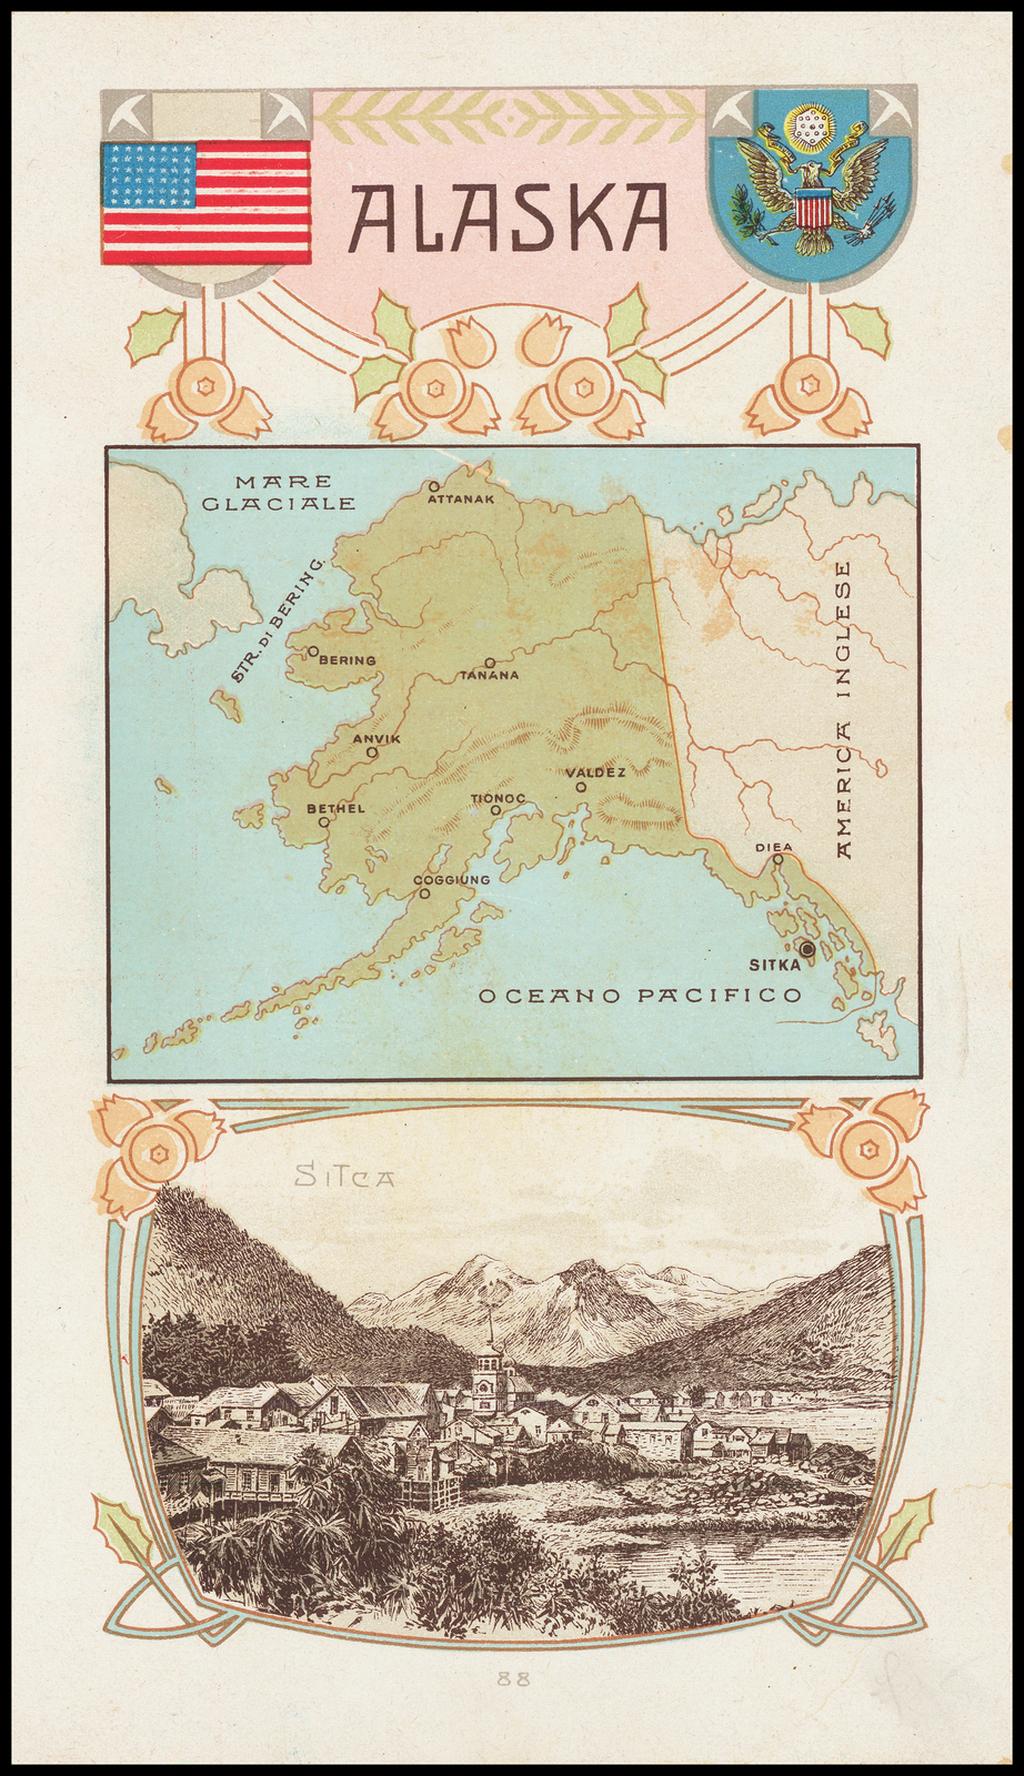 Alaska - Barry Lawrence Ruderman Antique Maps Inc